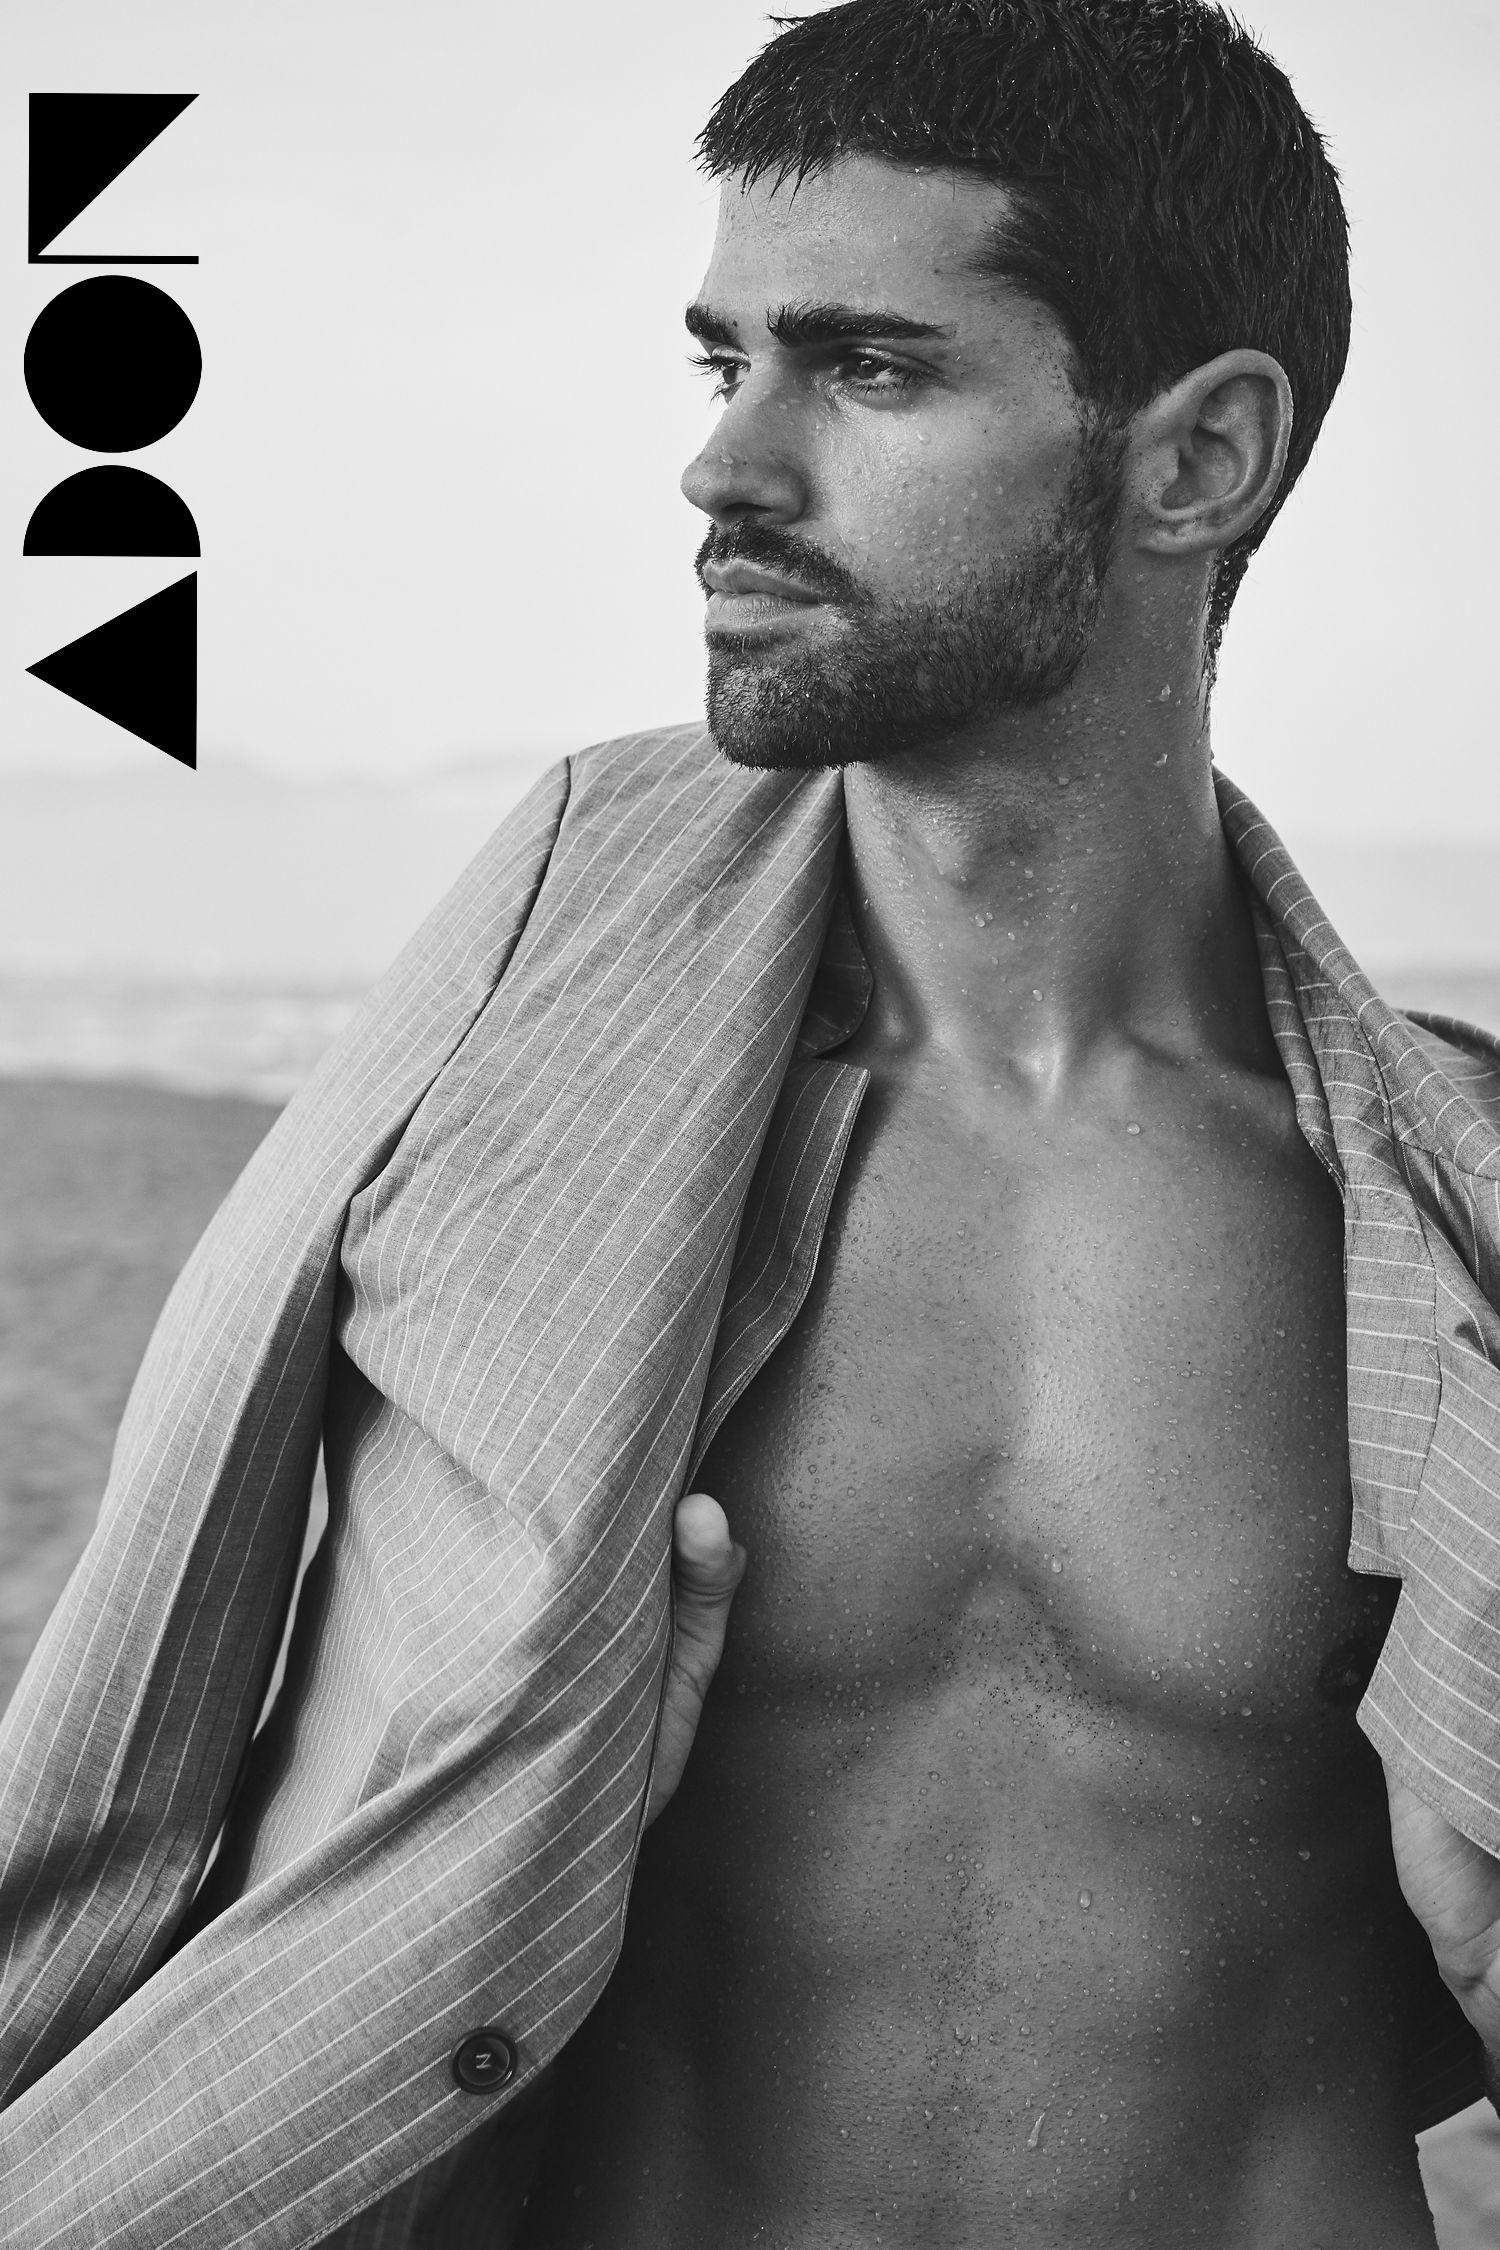 Adon Exclusive: Model Jairo Mores By Miguel Anxo